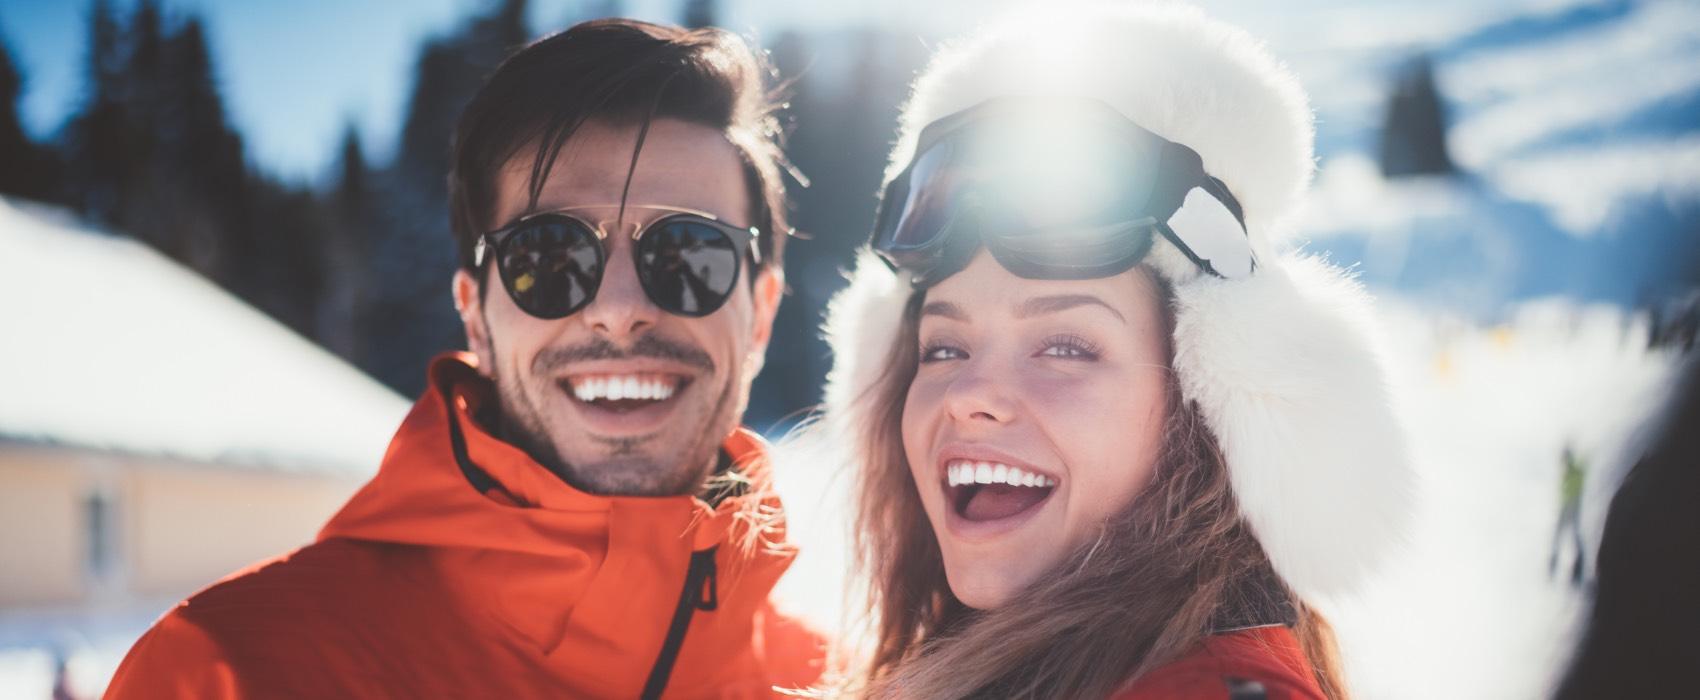 Skifahrer-Paar